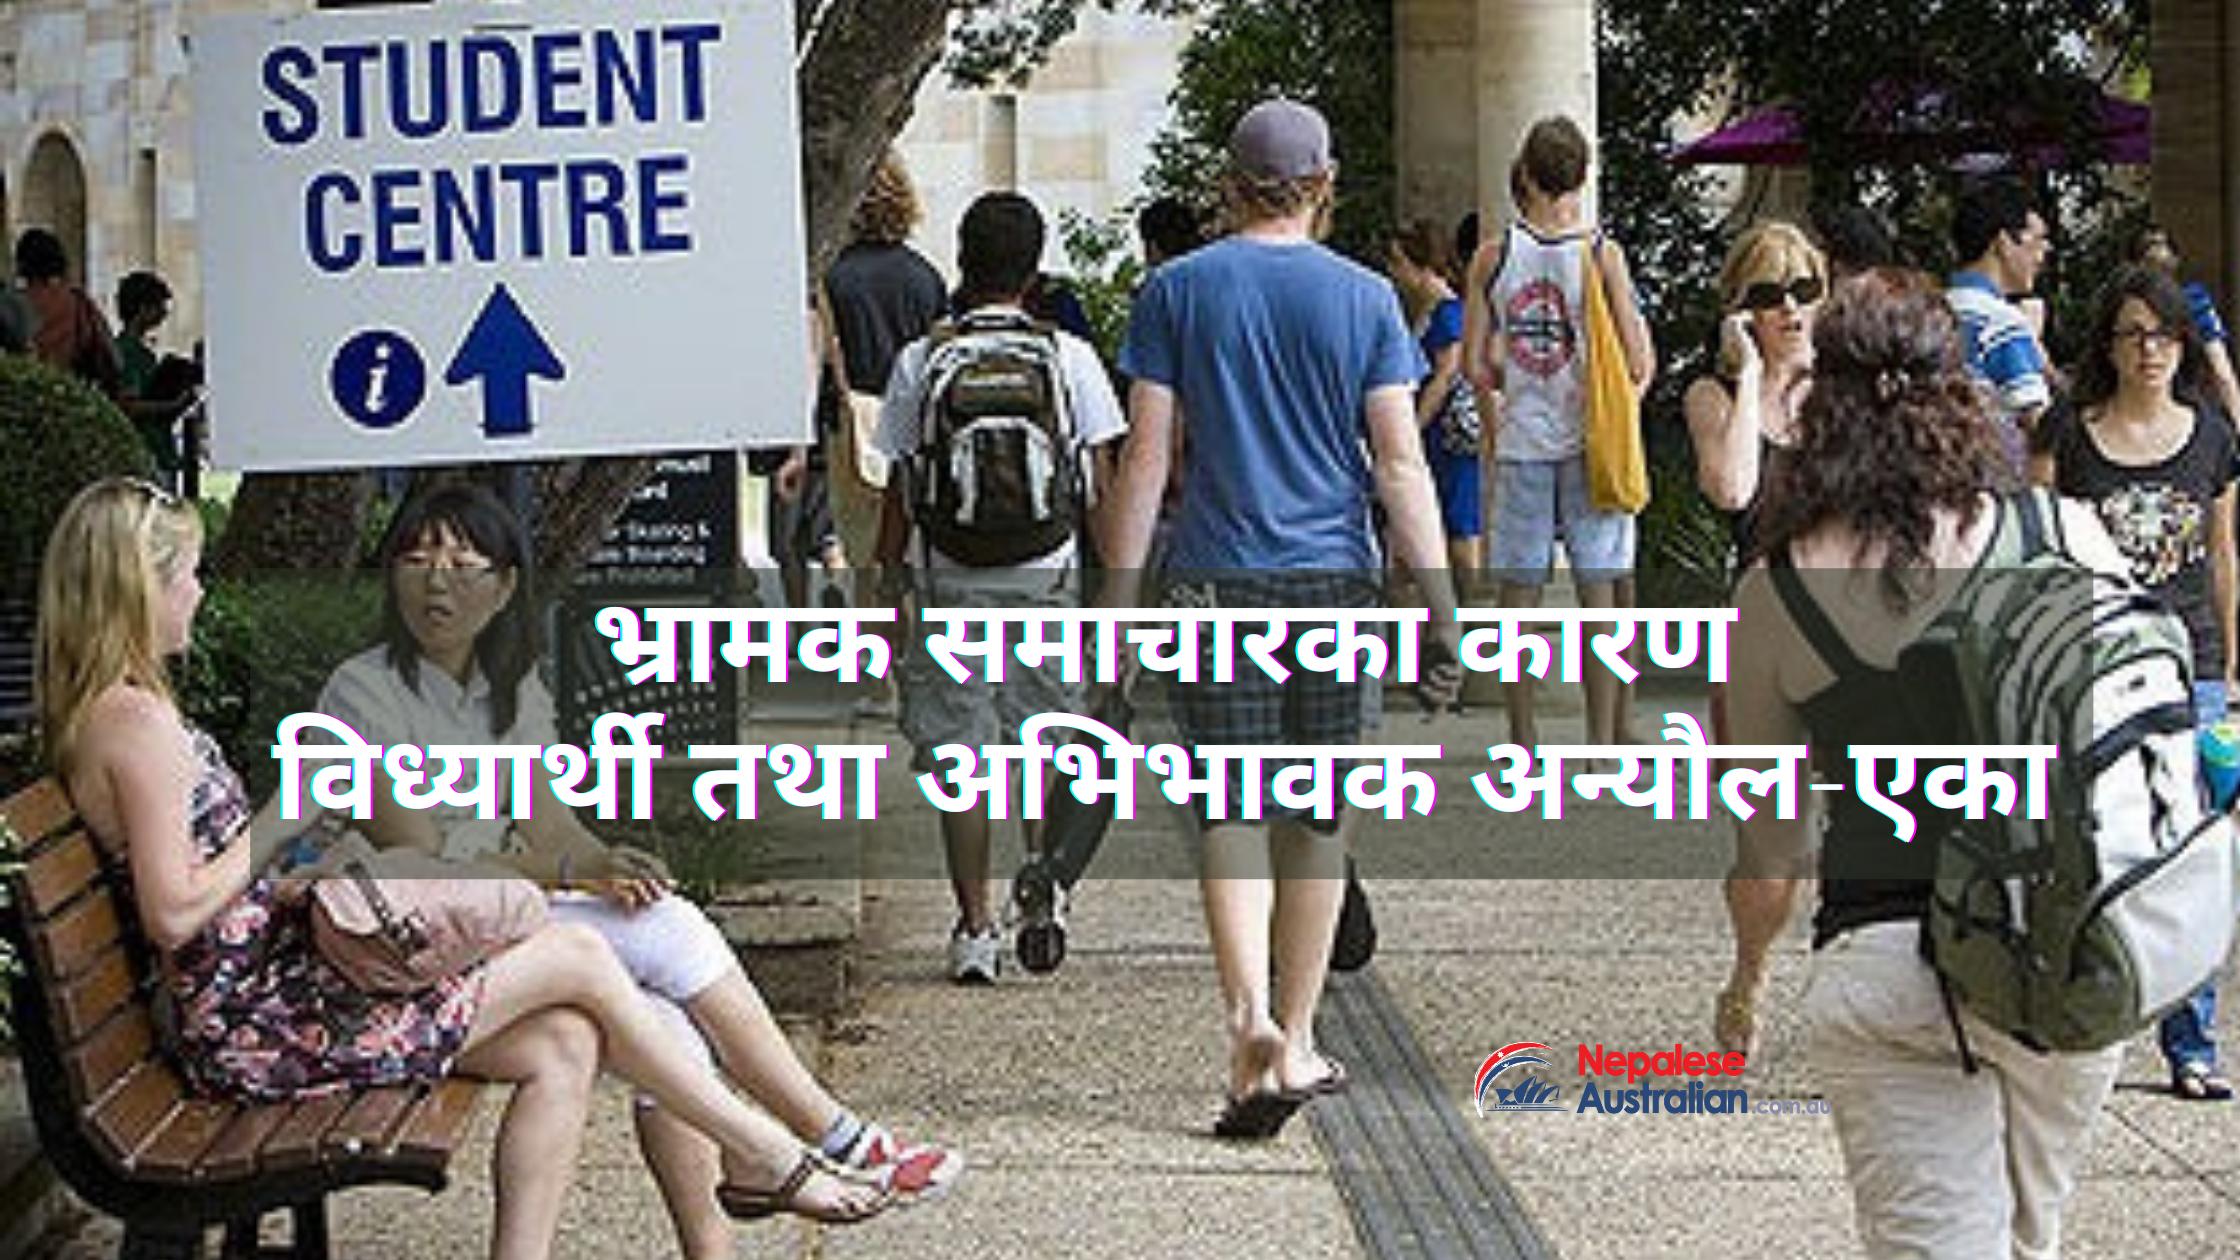 Nepalese International Student in Australia